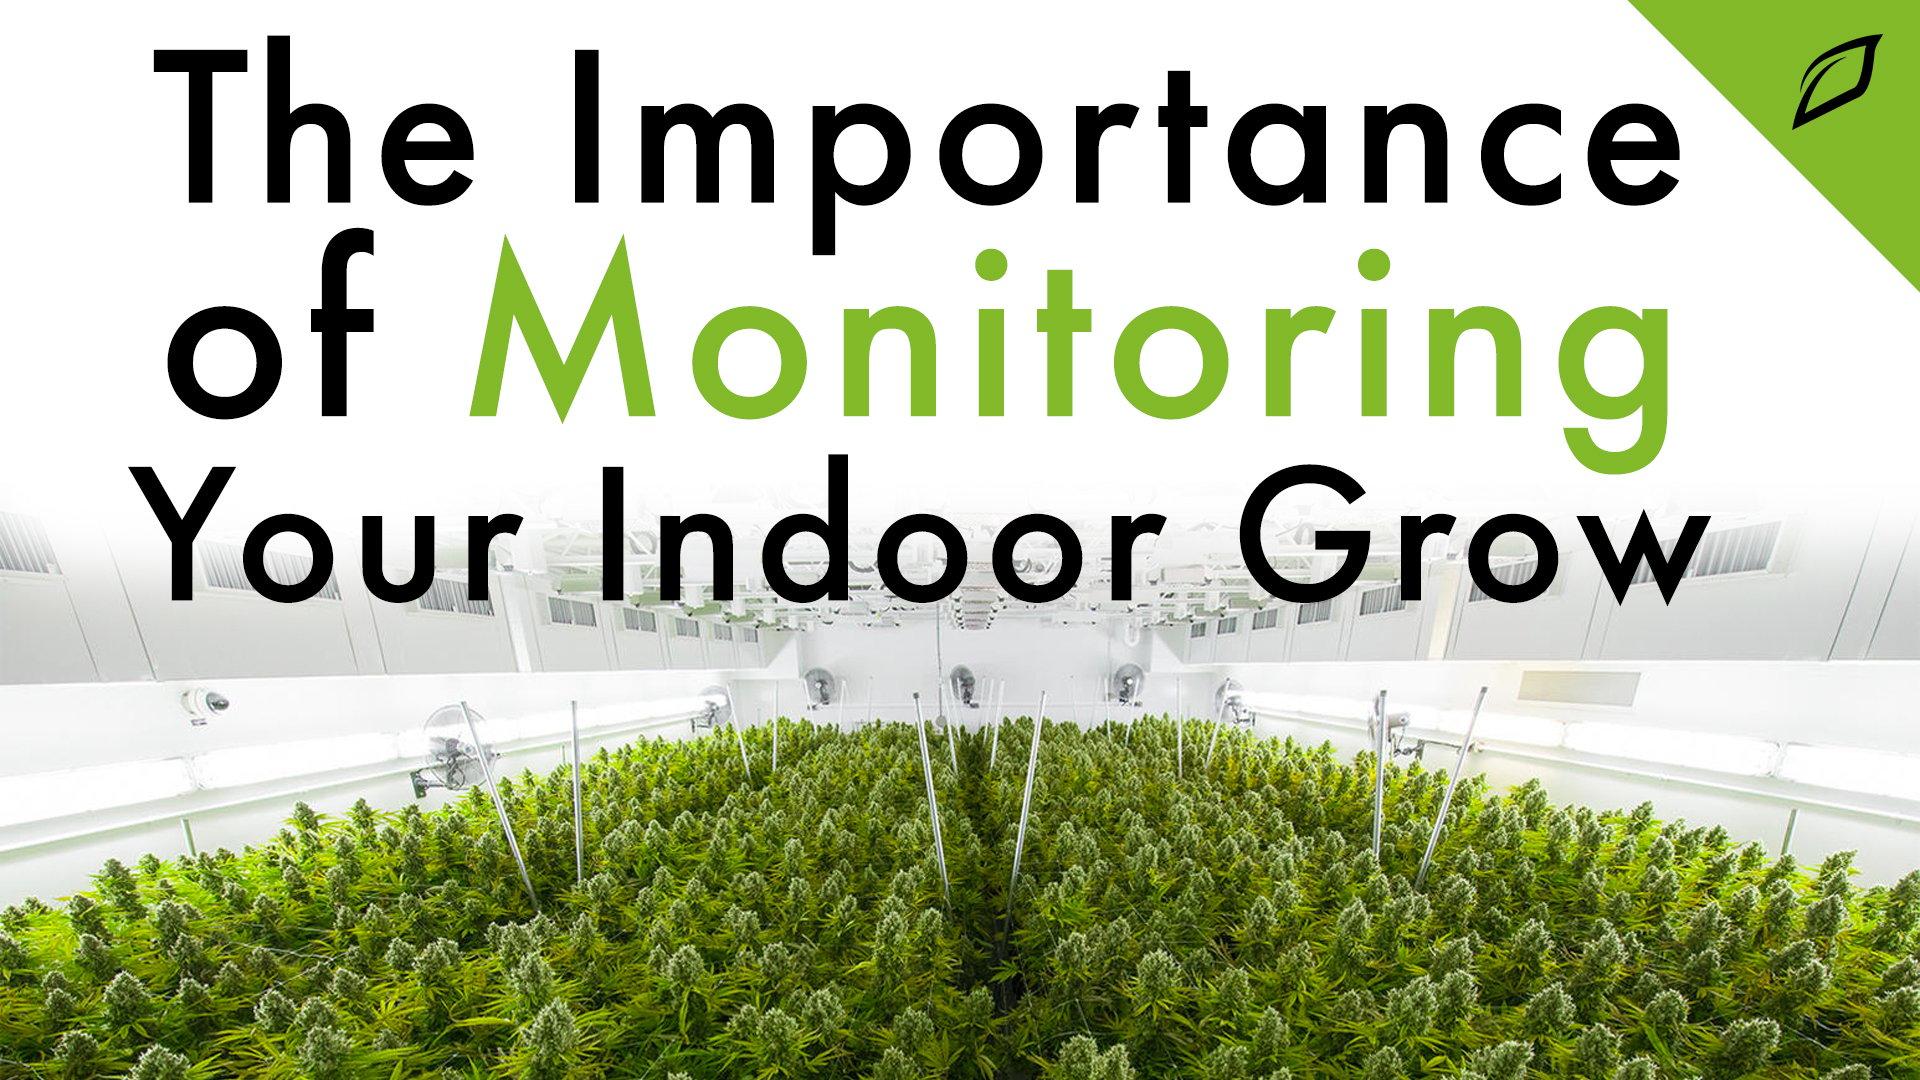 Importance of Monitoring Blog 16x9